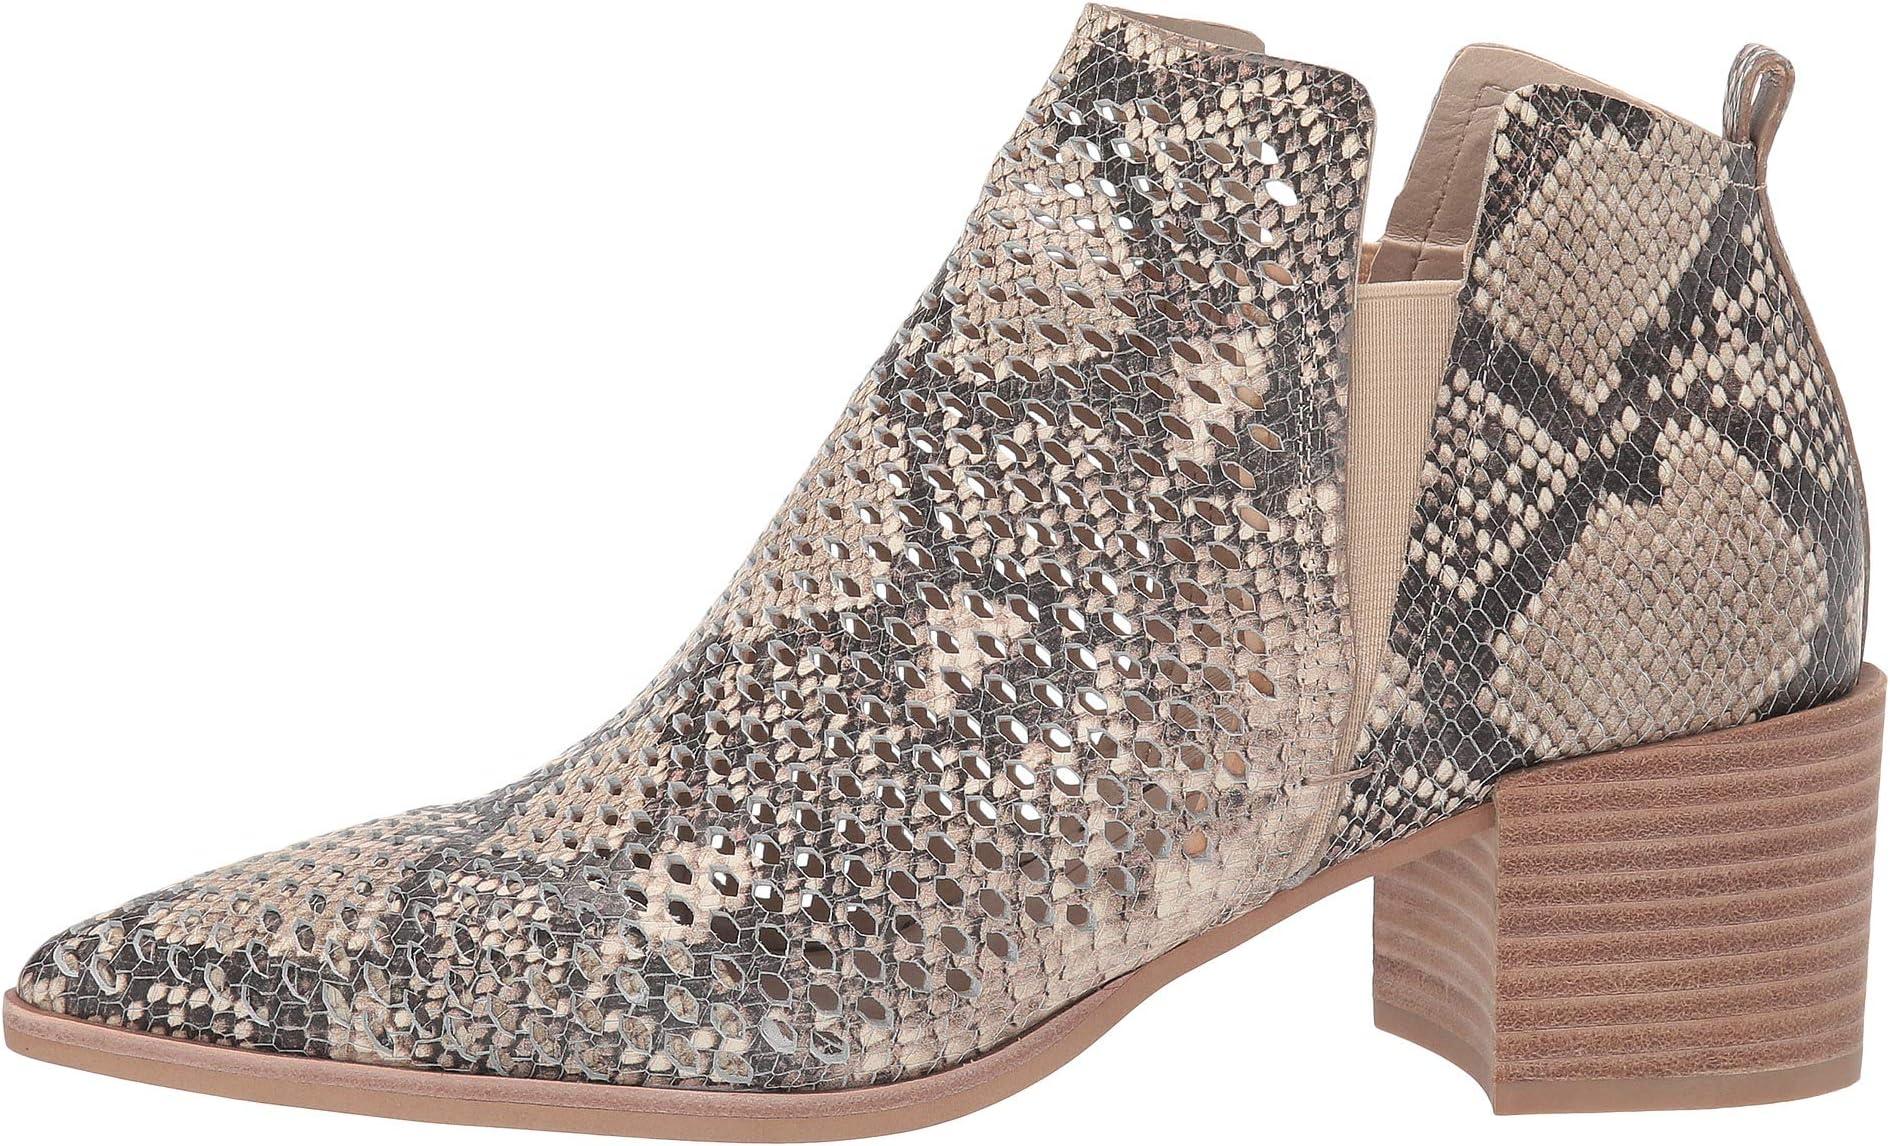 Dolce Vita Bianca   Women's shoes   2020 Newest